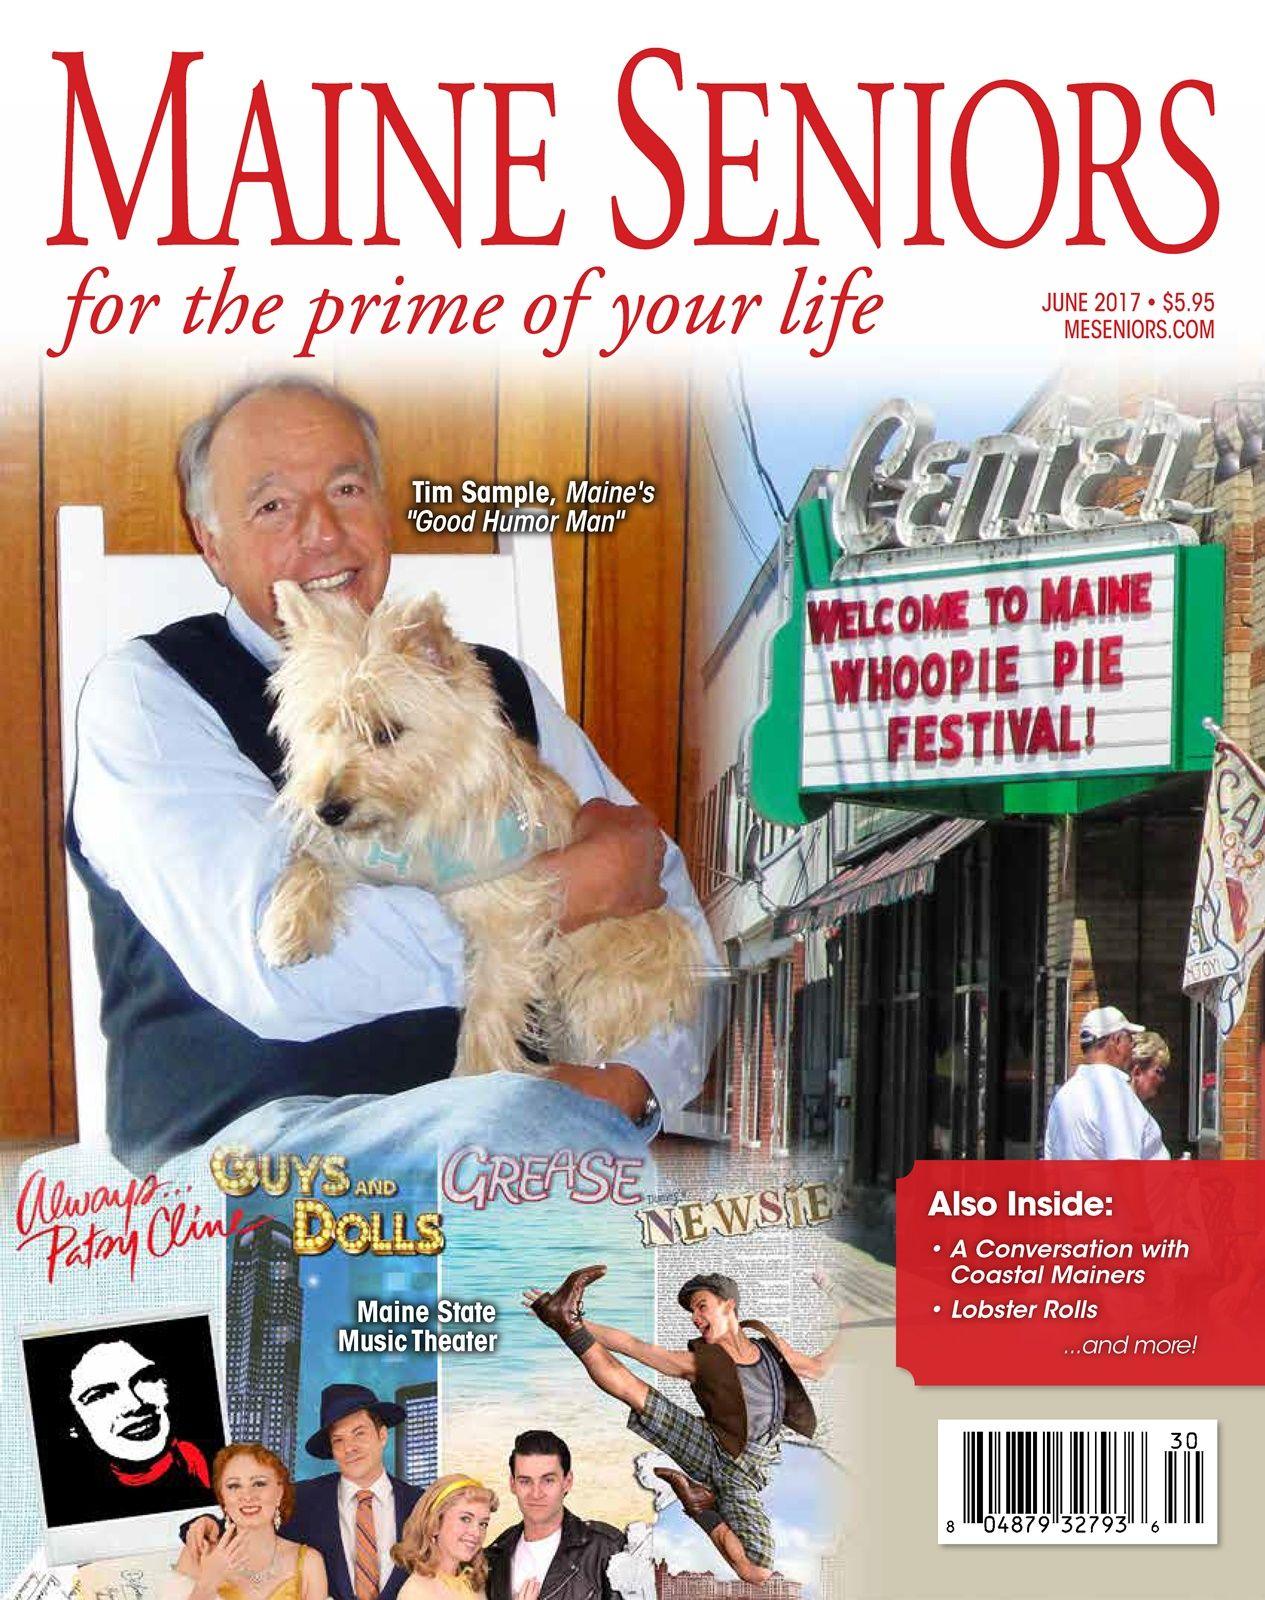 Maine seniors magazine 617 good humor man senior